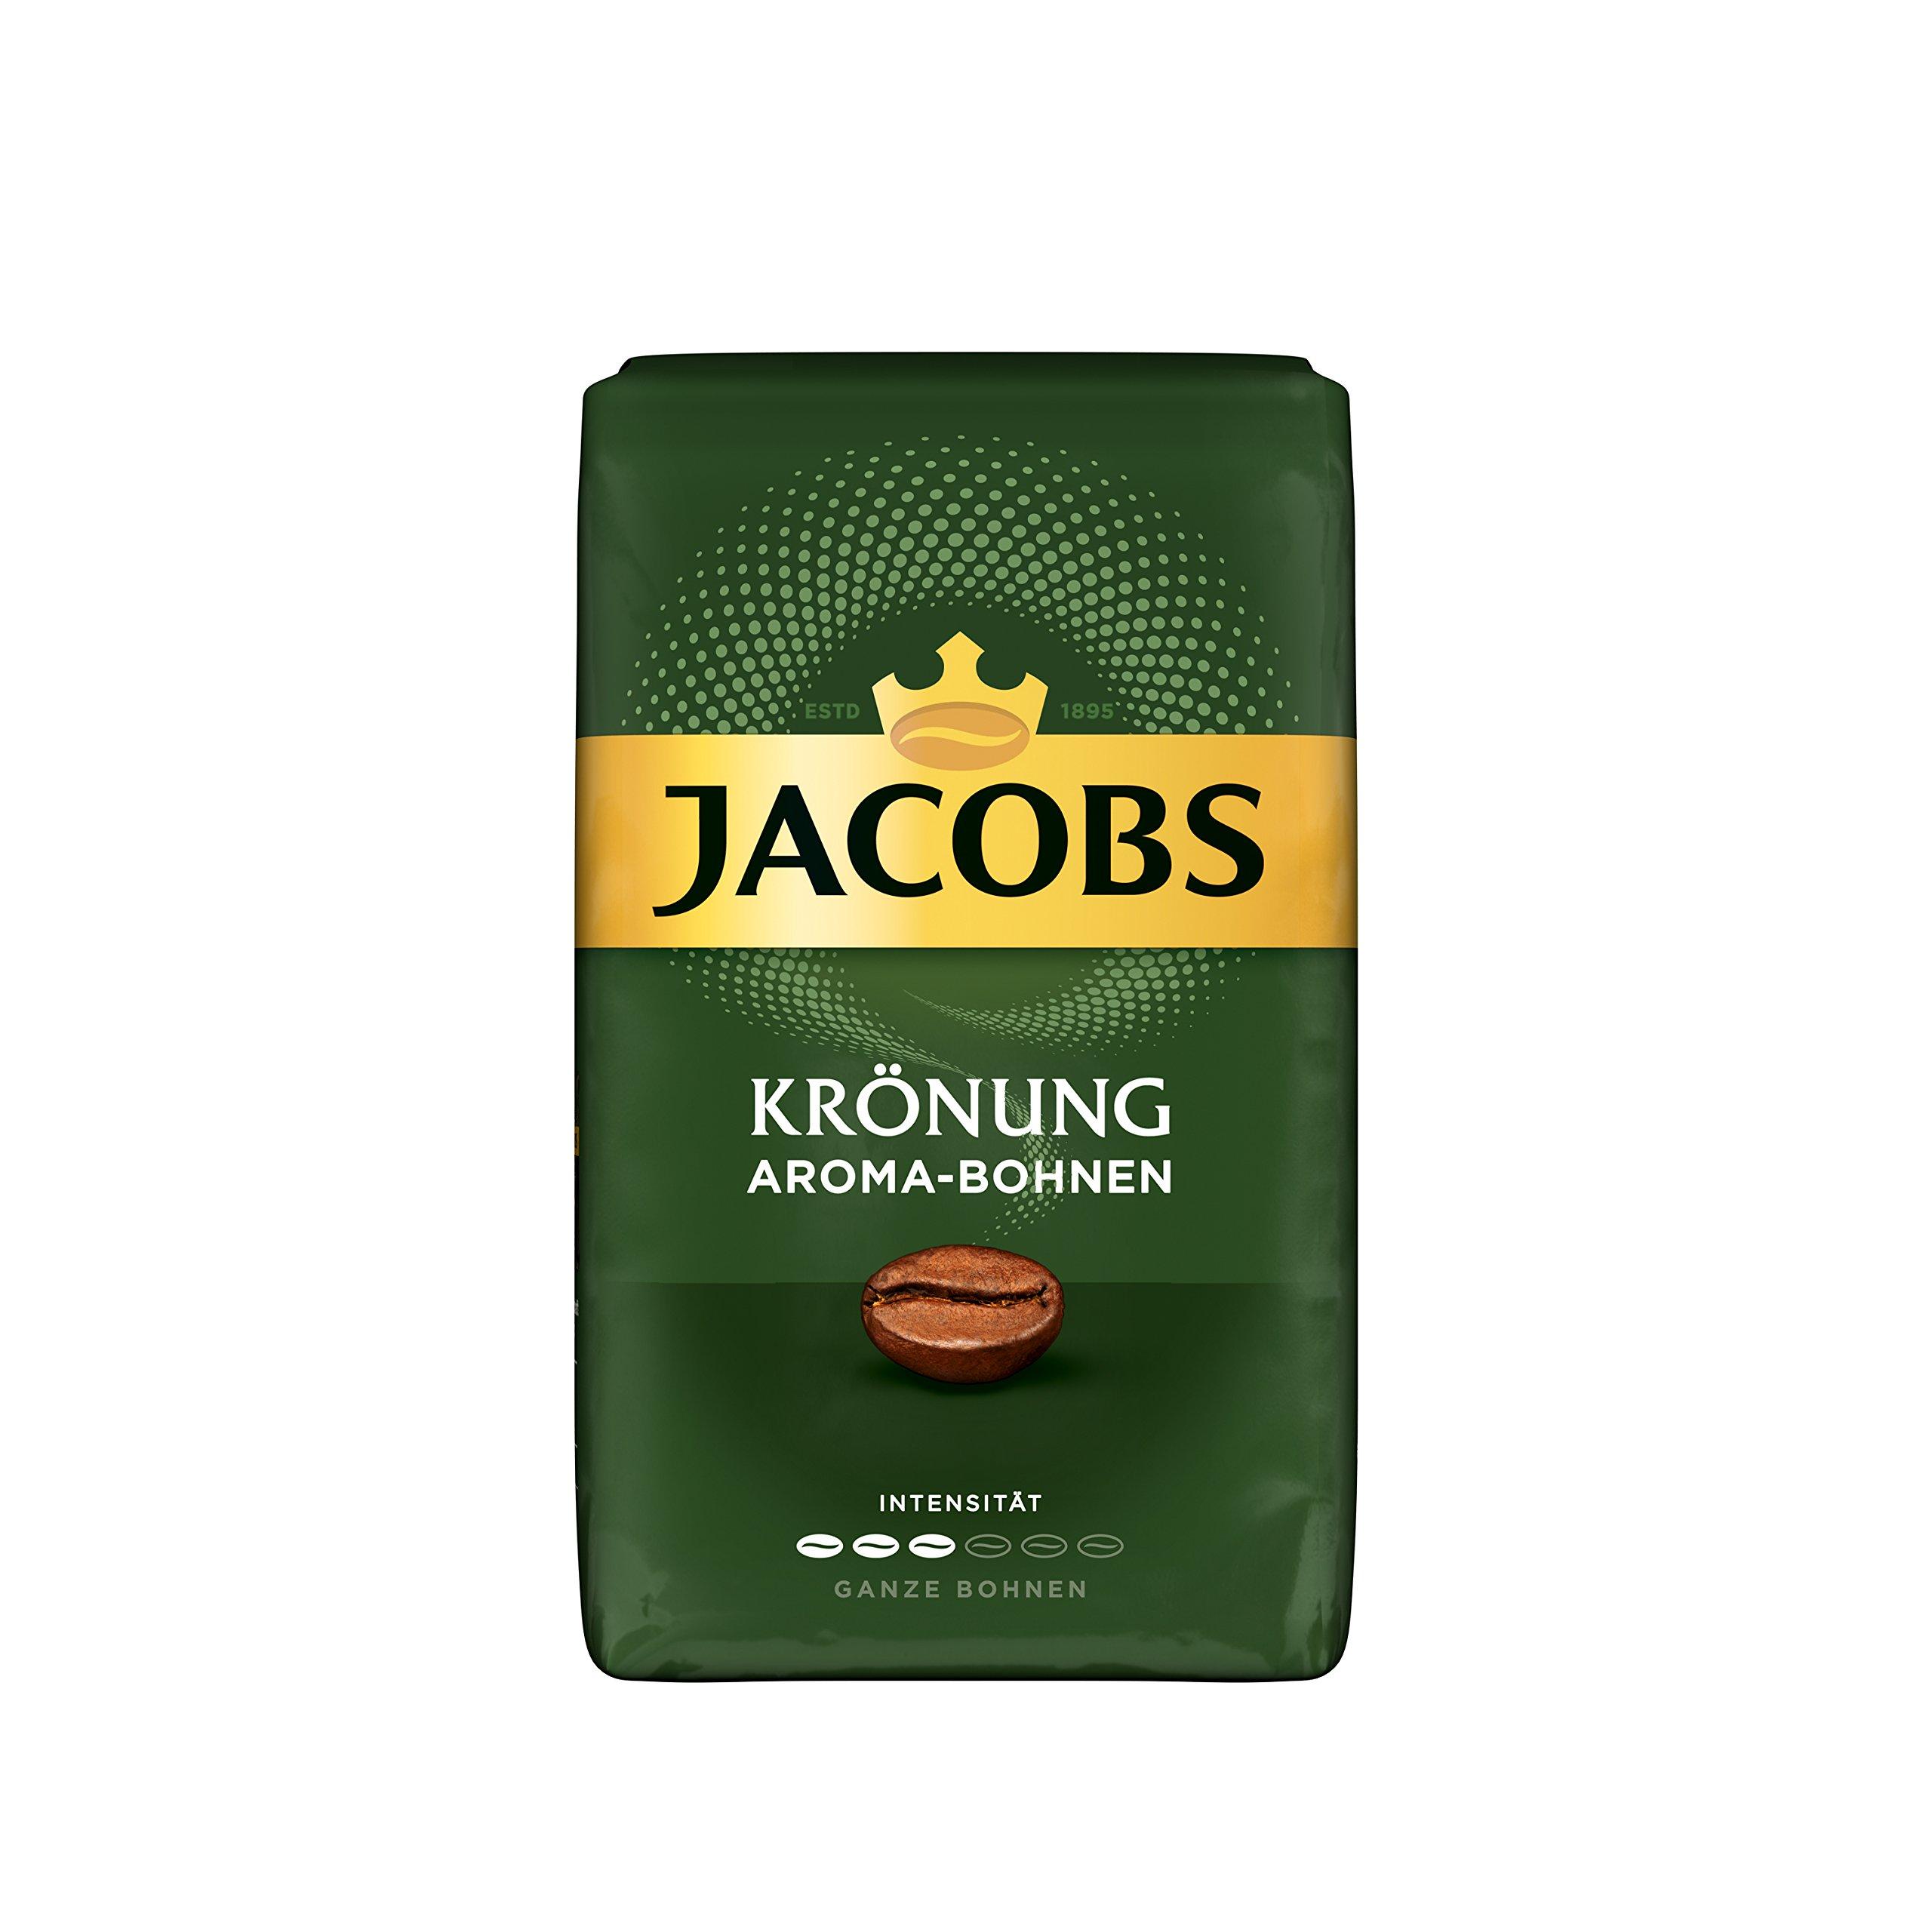 JACOBS KRONUNG WHOLE BEAN AROMA BOHNEN COFFEE CASE 12 x 500g by JACOBS WHOLE BEAN COFFEE (Image #1)